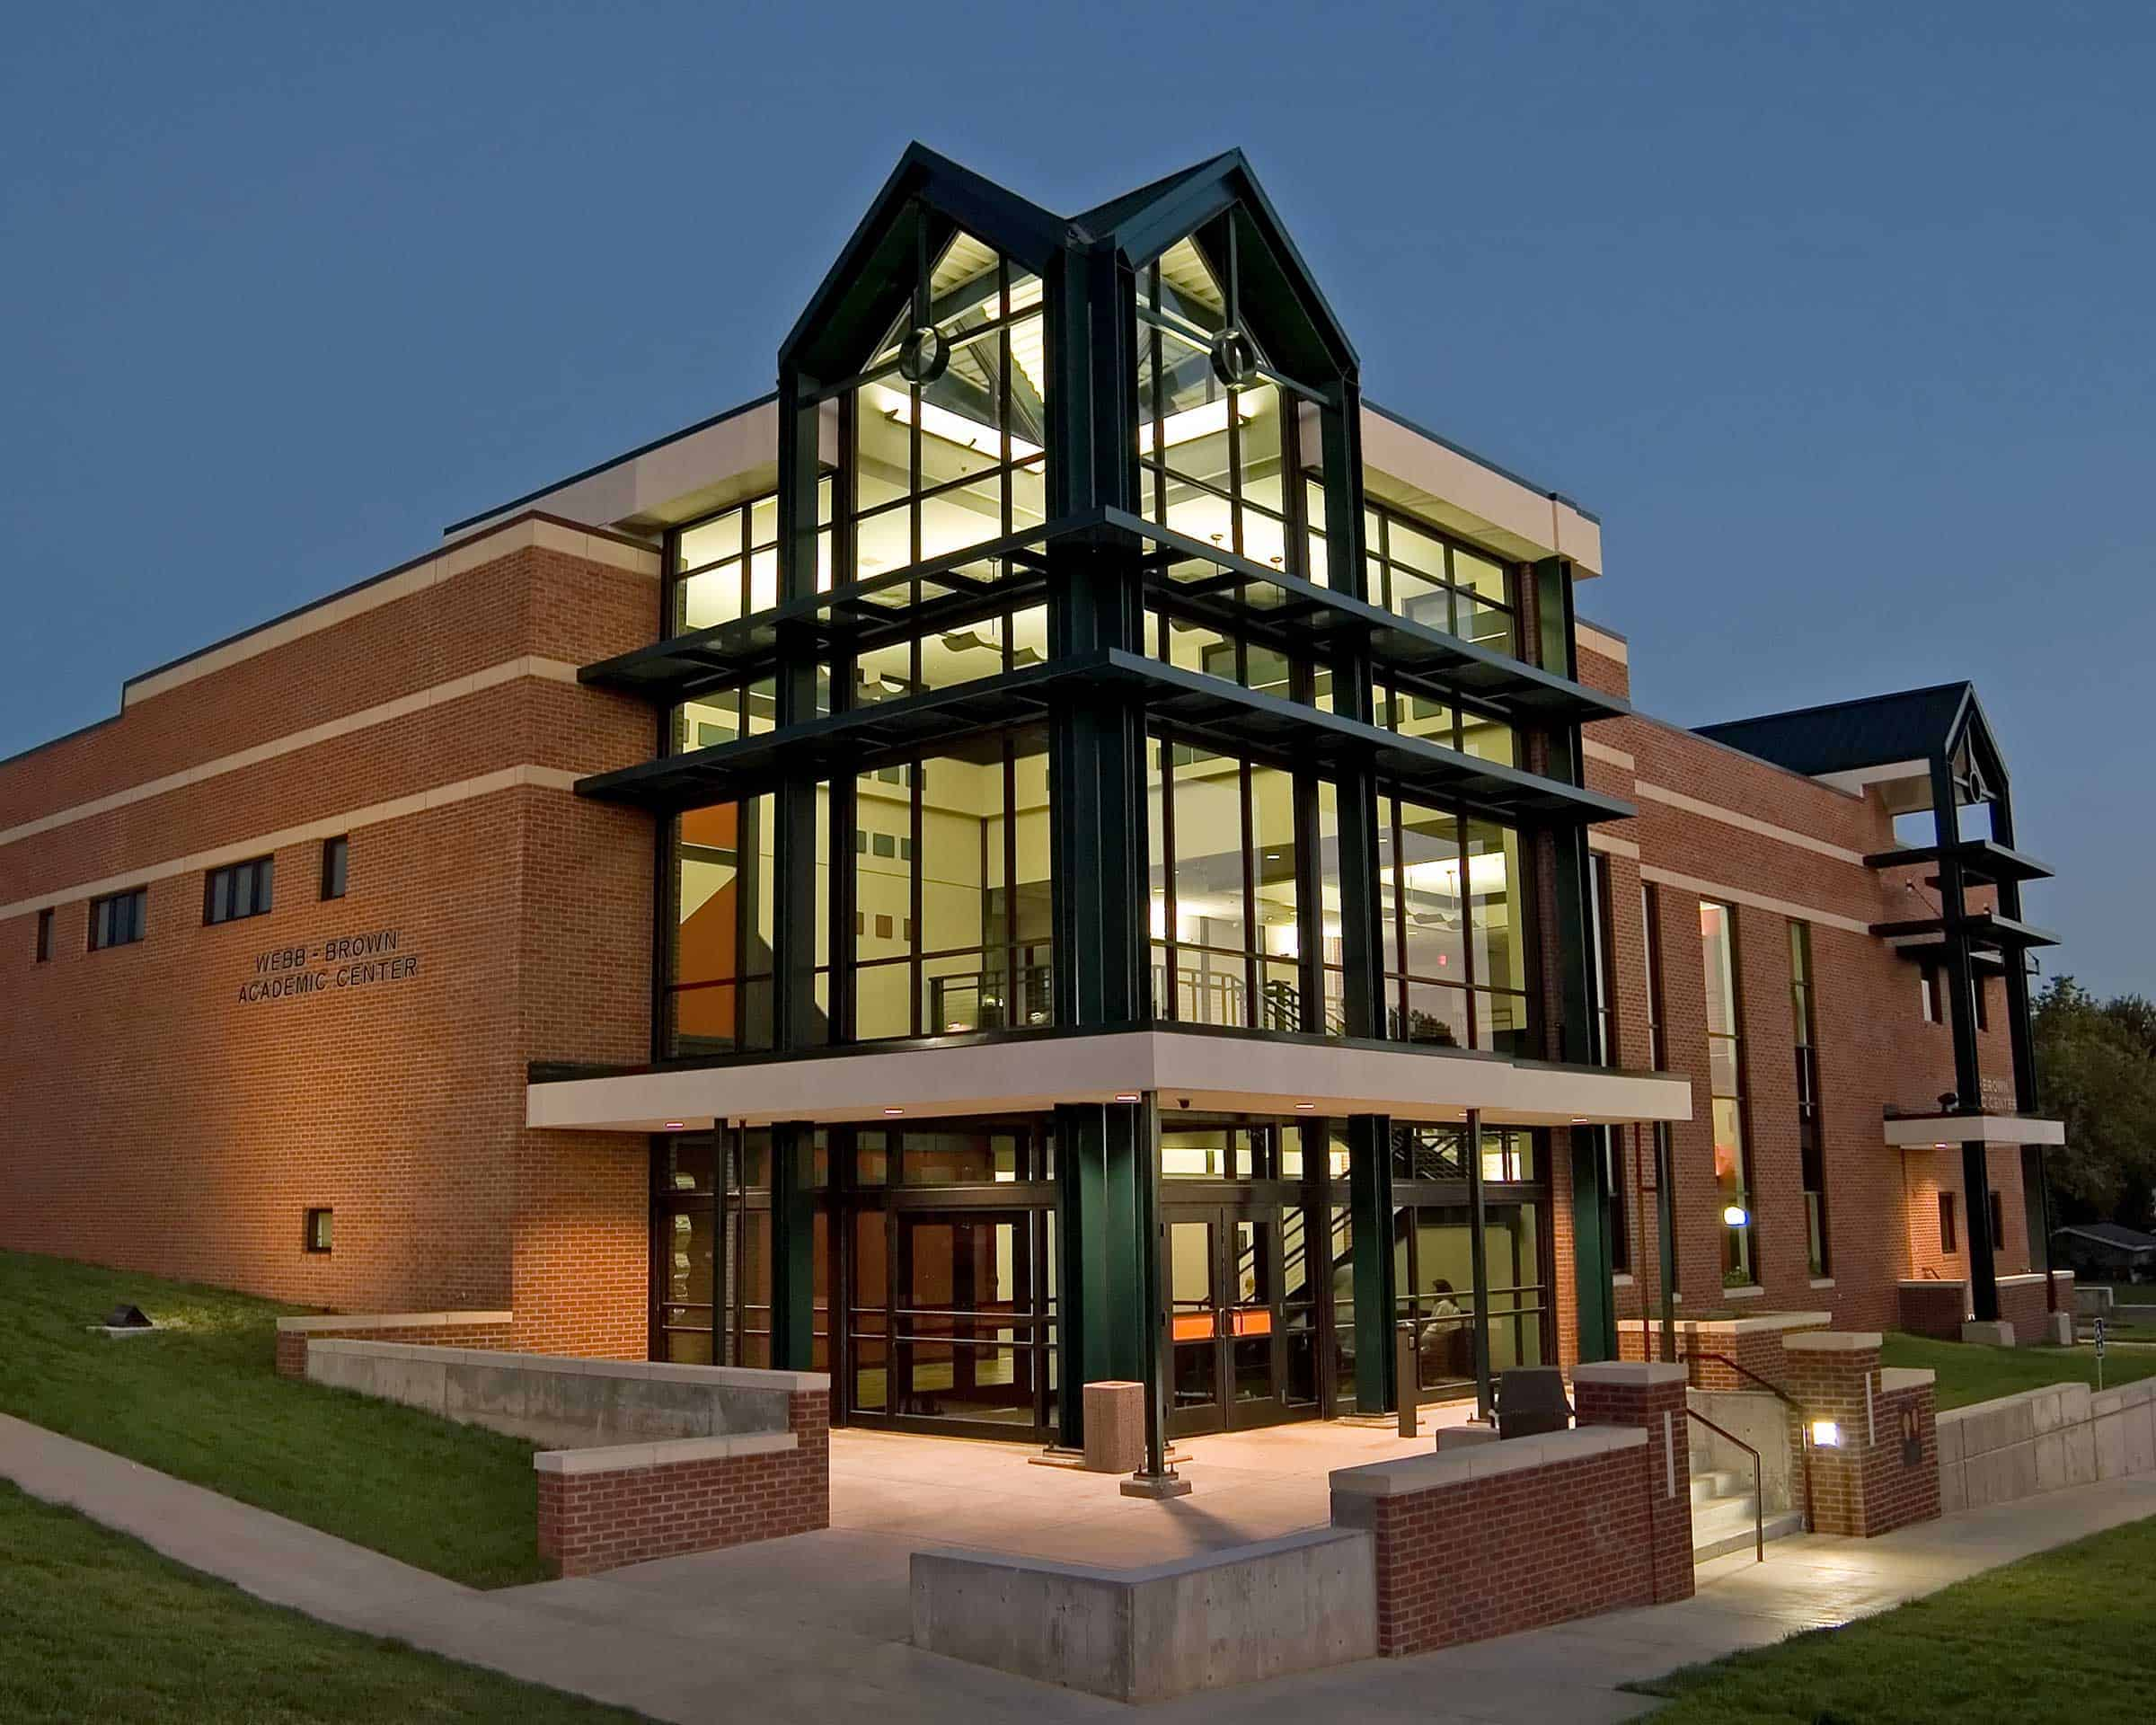 Web Brown Center